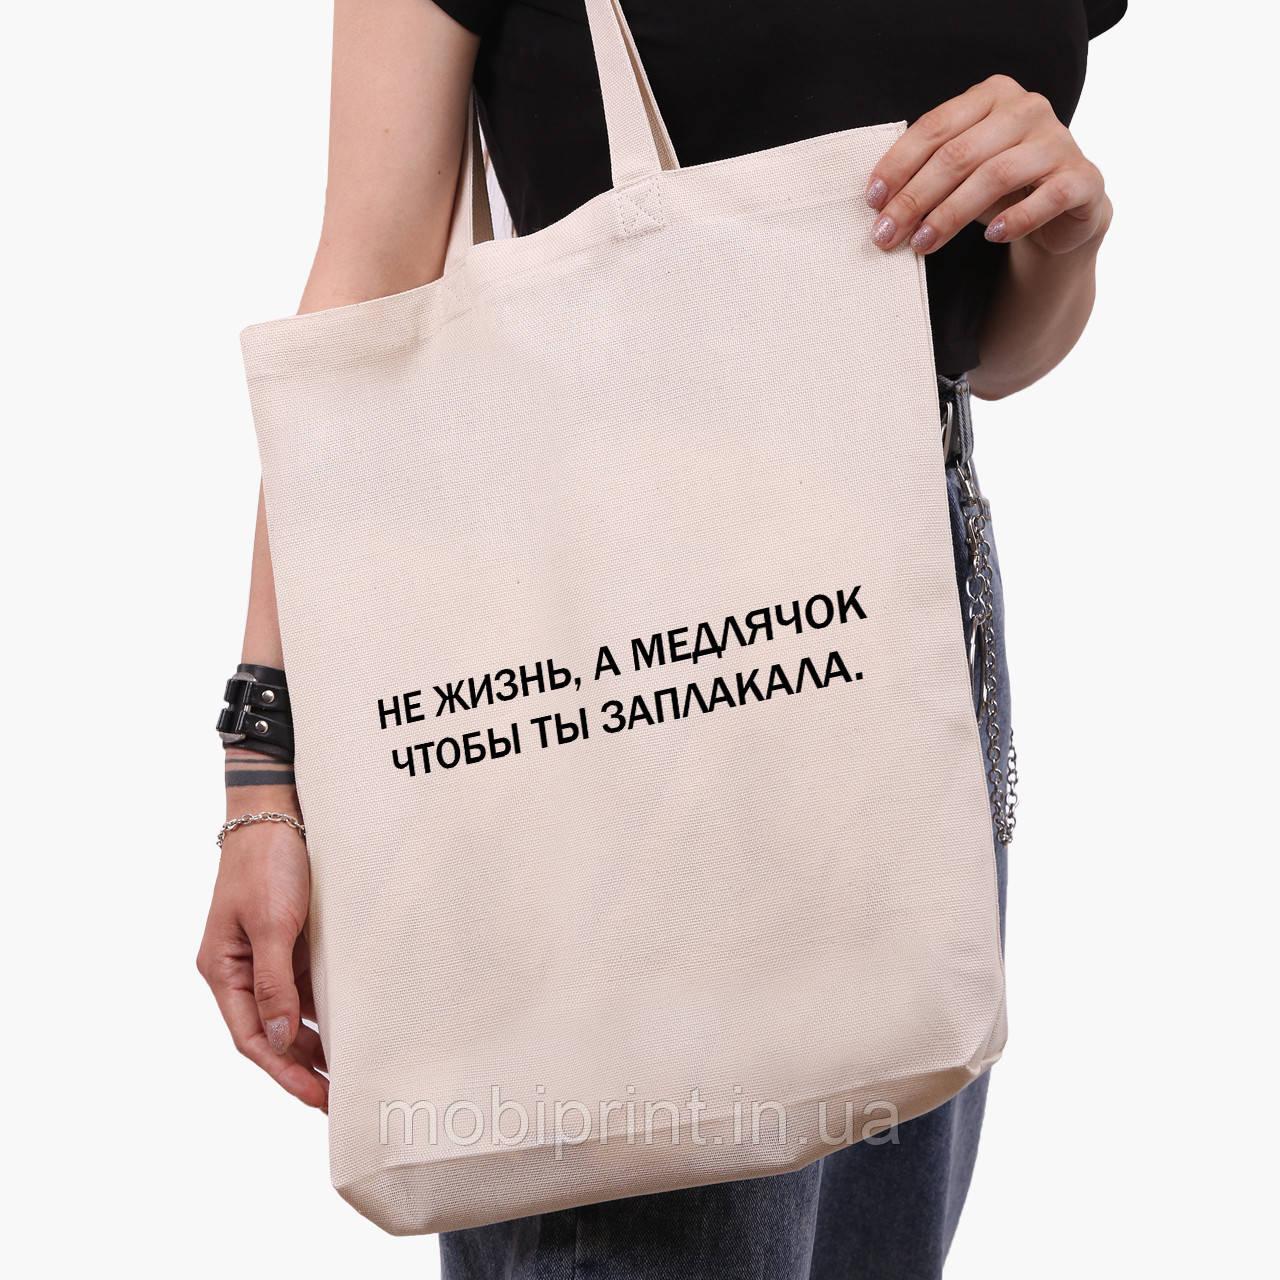 Еко сумка шоппер біла Медлячок (Slow dance) (9227-1785-1) экосумка шопер 41*39*8 см